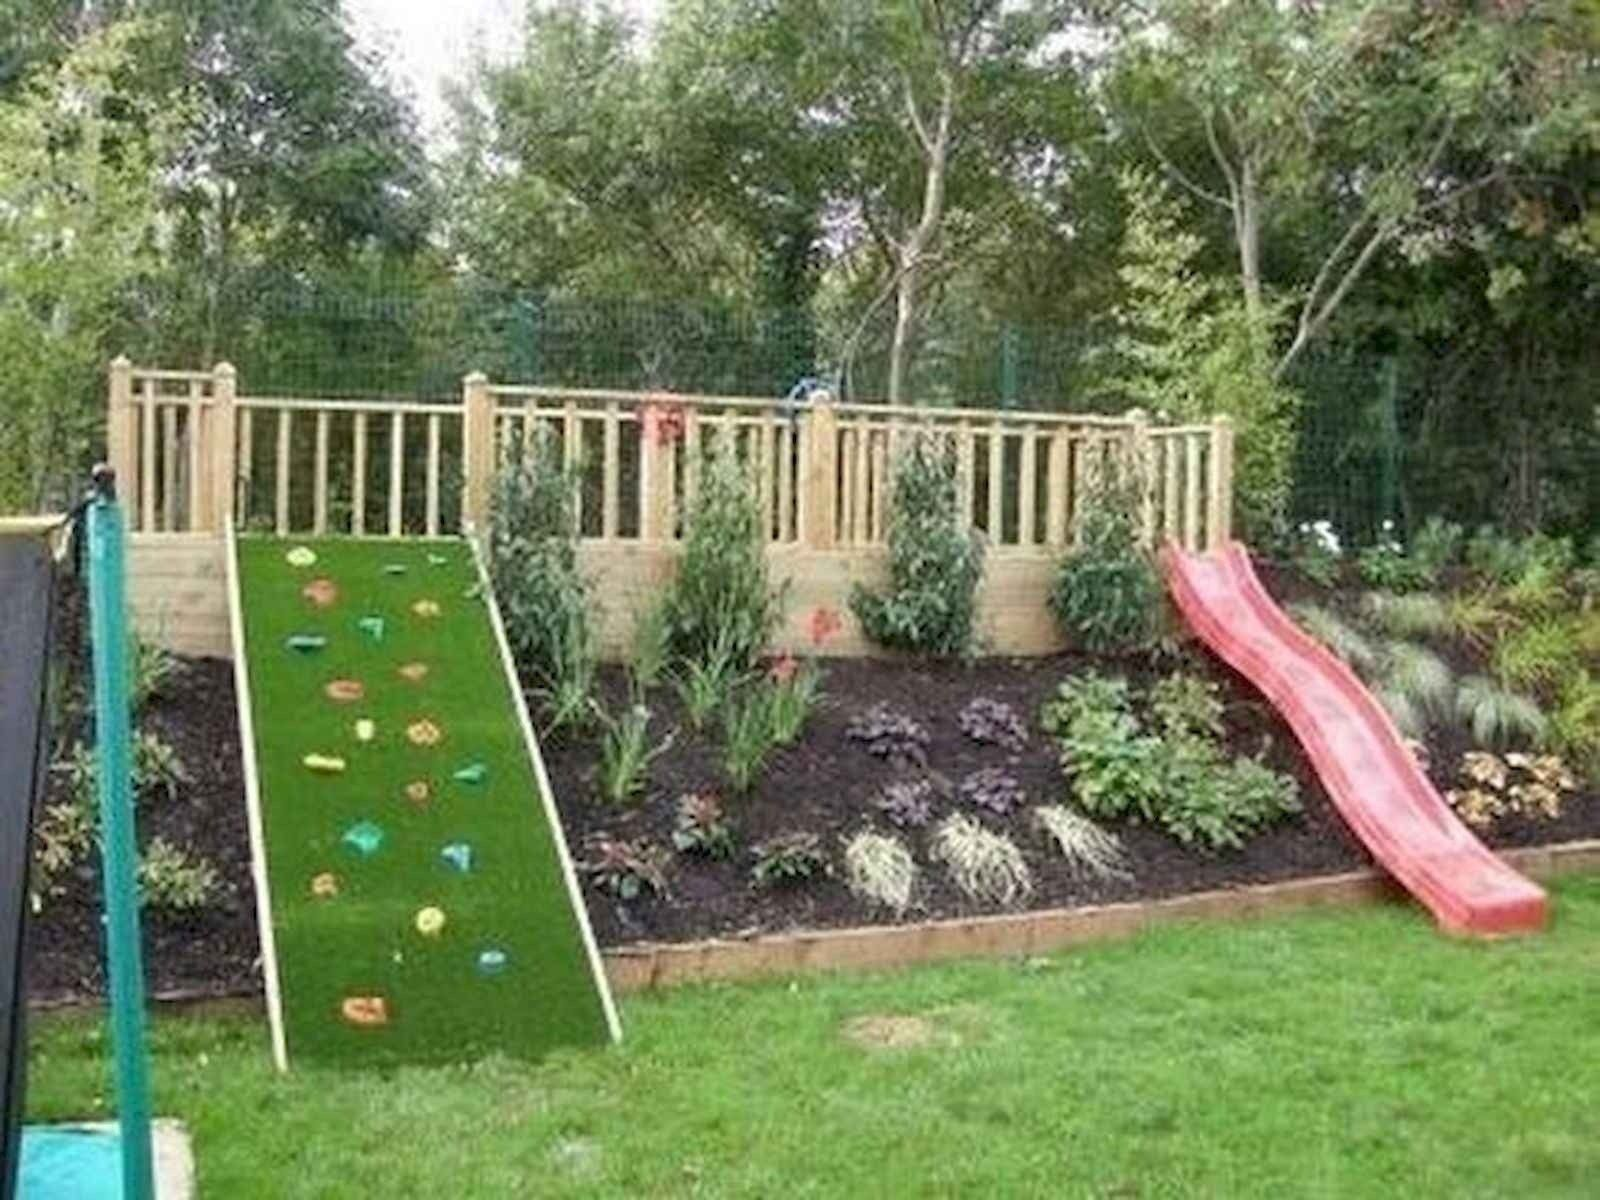 30 Fantastic Backyard Kids Ideas Play Spaces Design Ideas And Remodel Kid Friendly Backyard Play Area Backyard Backyard Playground Diy backyard hill slide